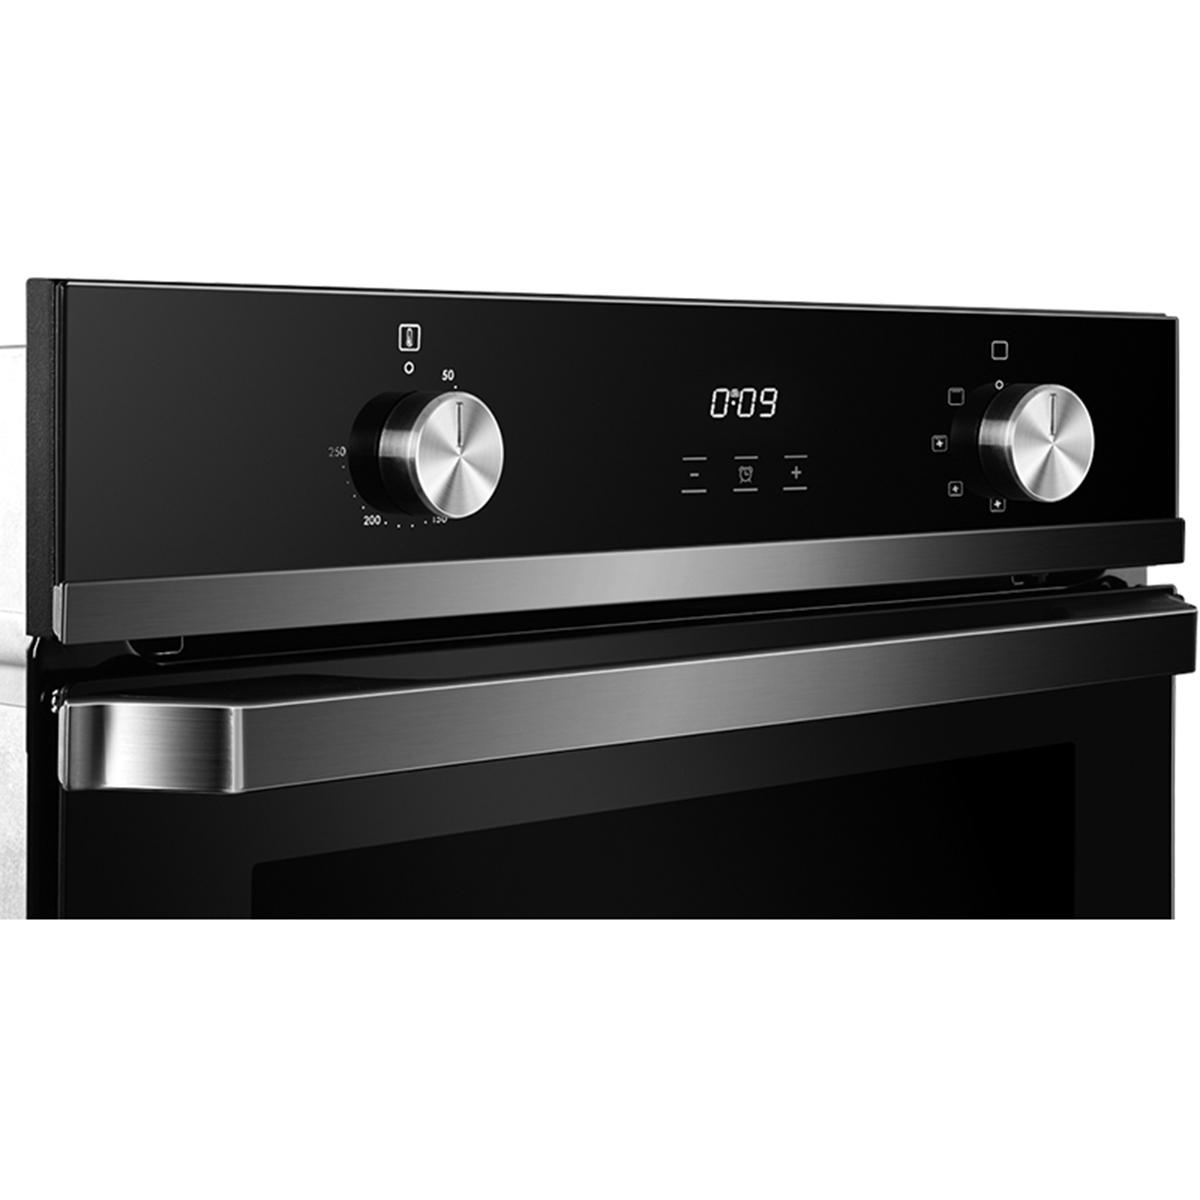 Casarte/卡萨帝                         嵌入式厨电                         C5O60ME7B1